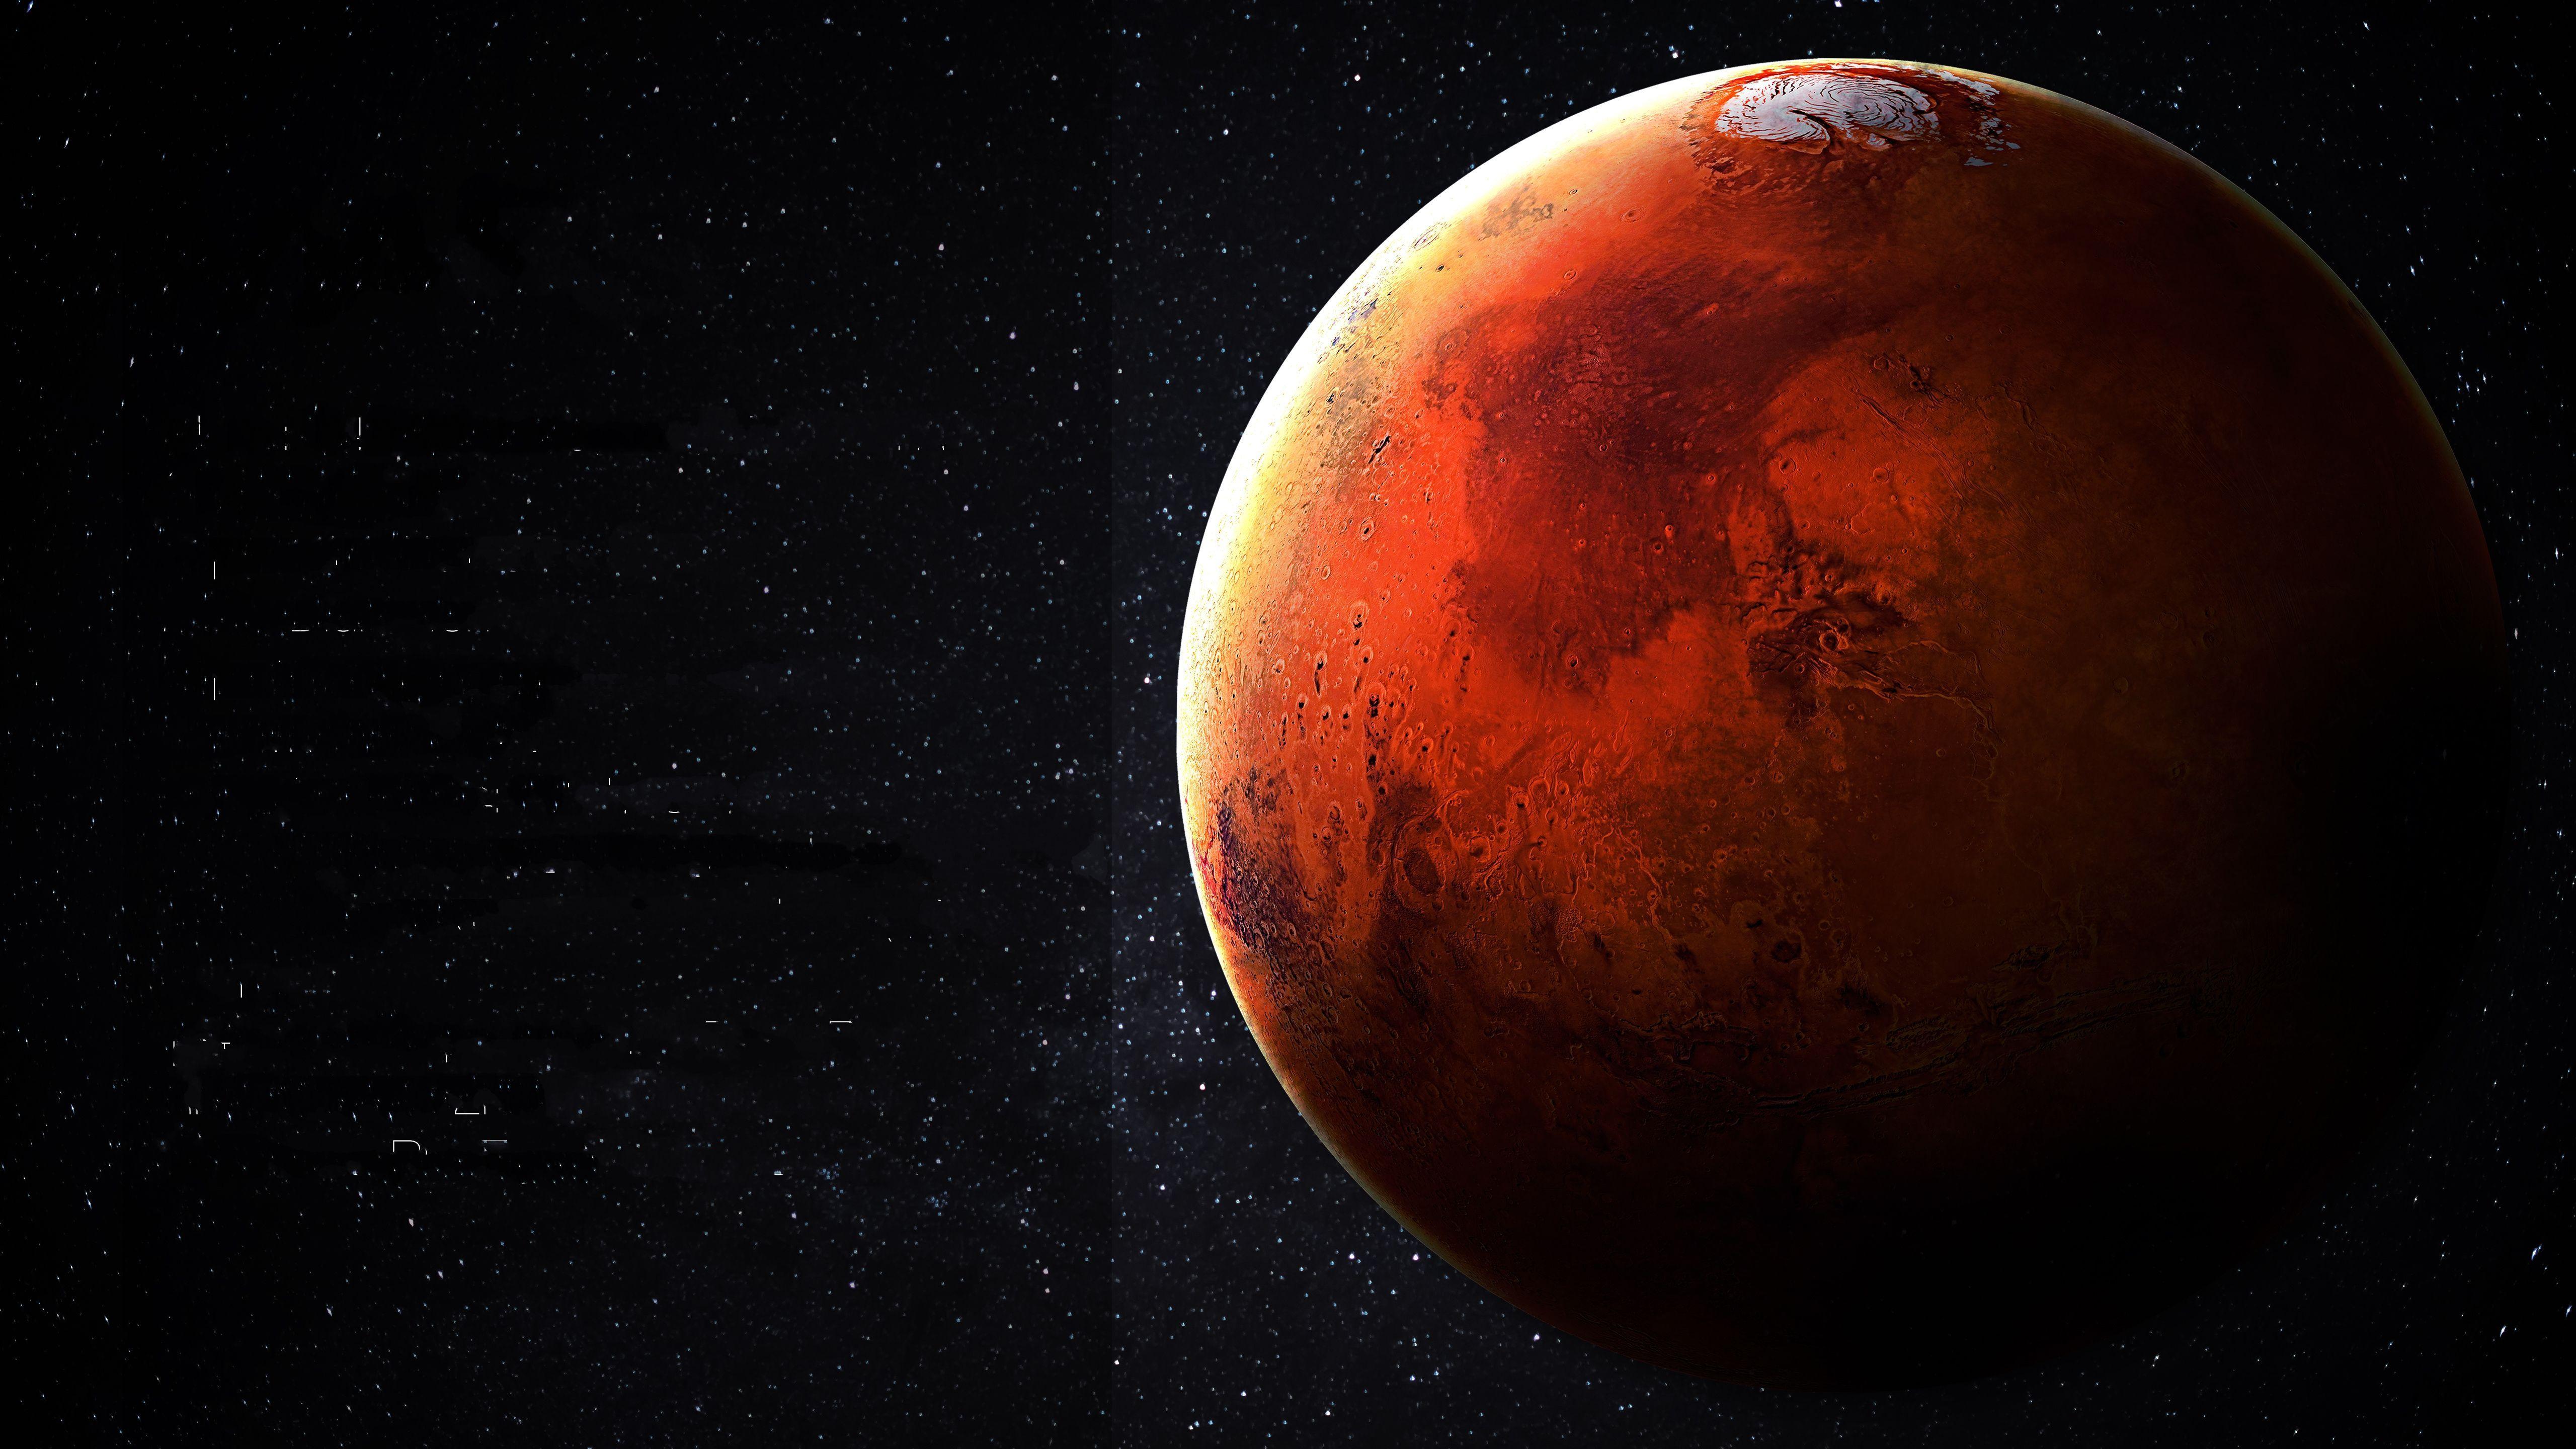 25 Mars HD Wallpapers